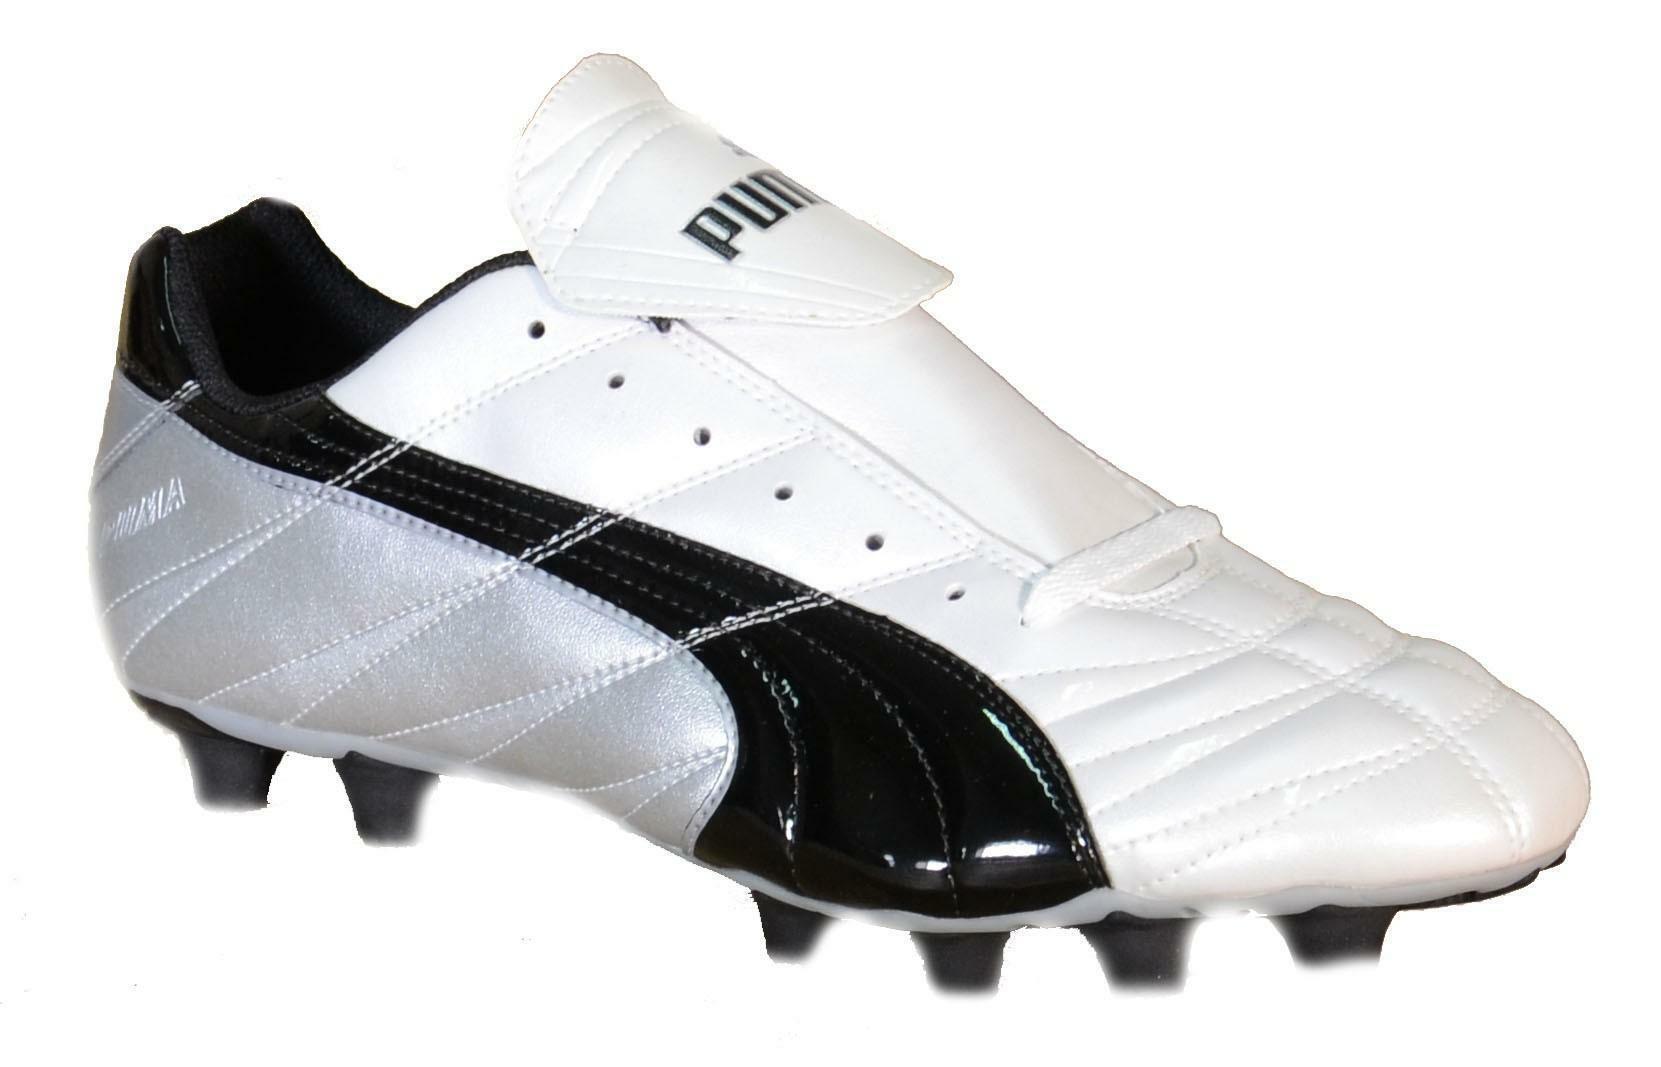 puma puma torceira i fg scarpini calcio bianchi pelle 100421